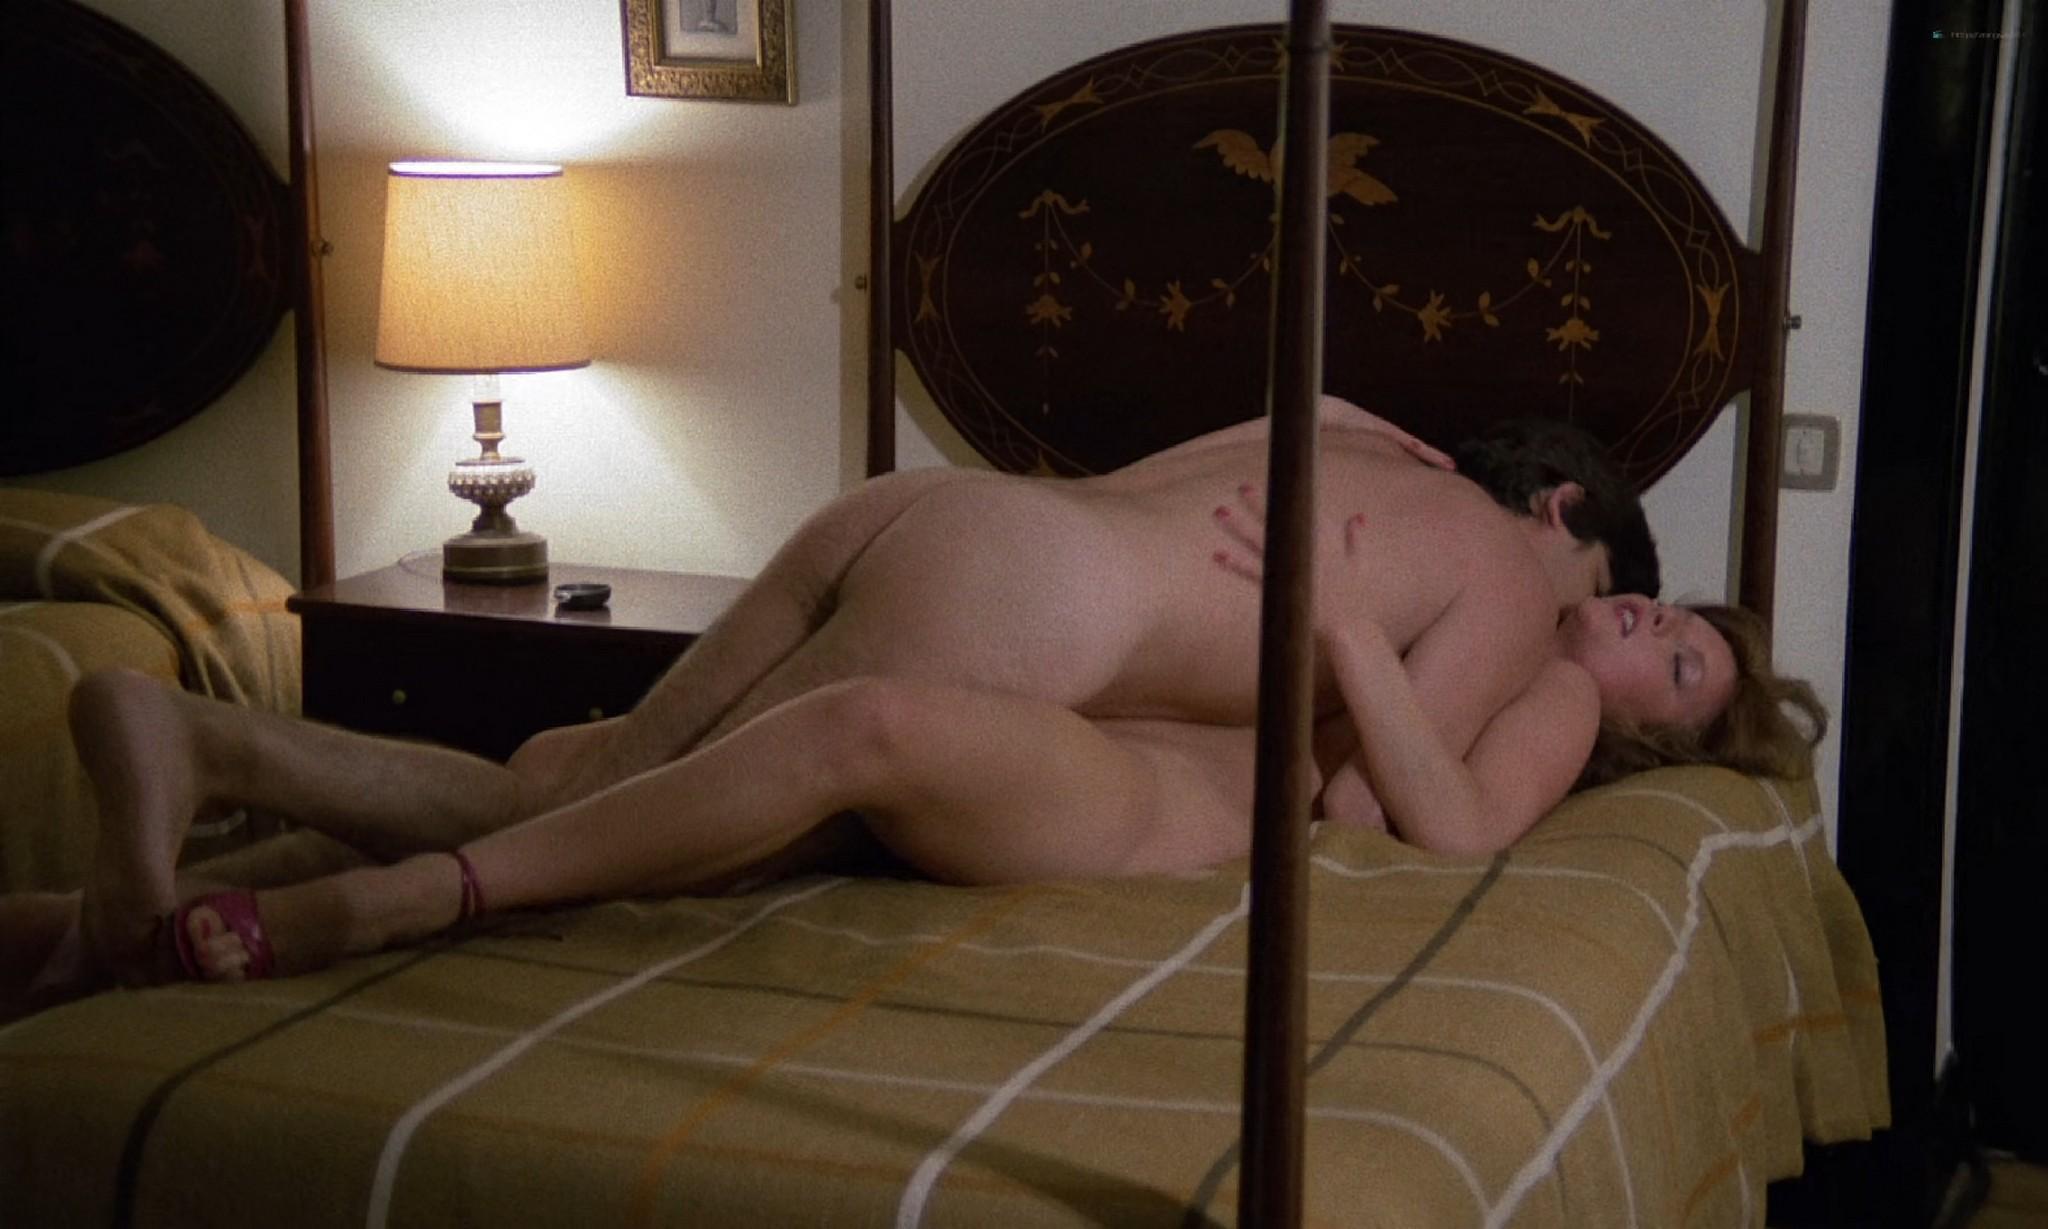 Muriel Montosse nude full frontal Ana Paula Lina Romay nude too Cecilia 1983 HD 1080p BluRay REMUX 005